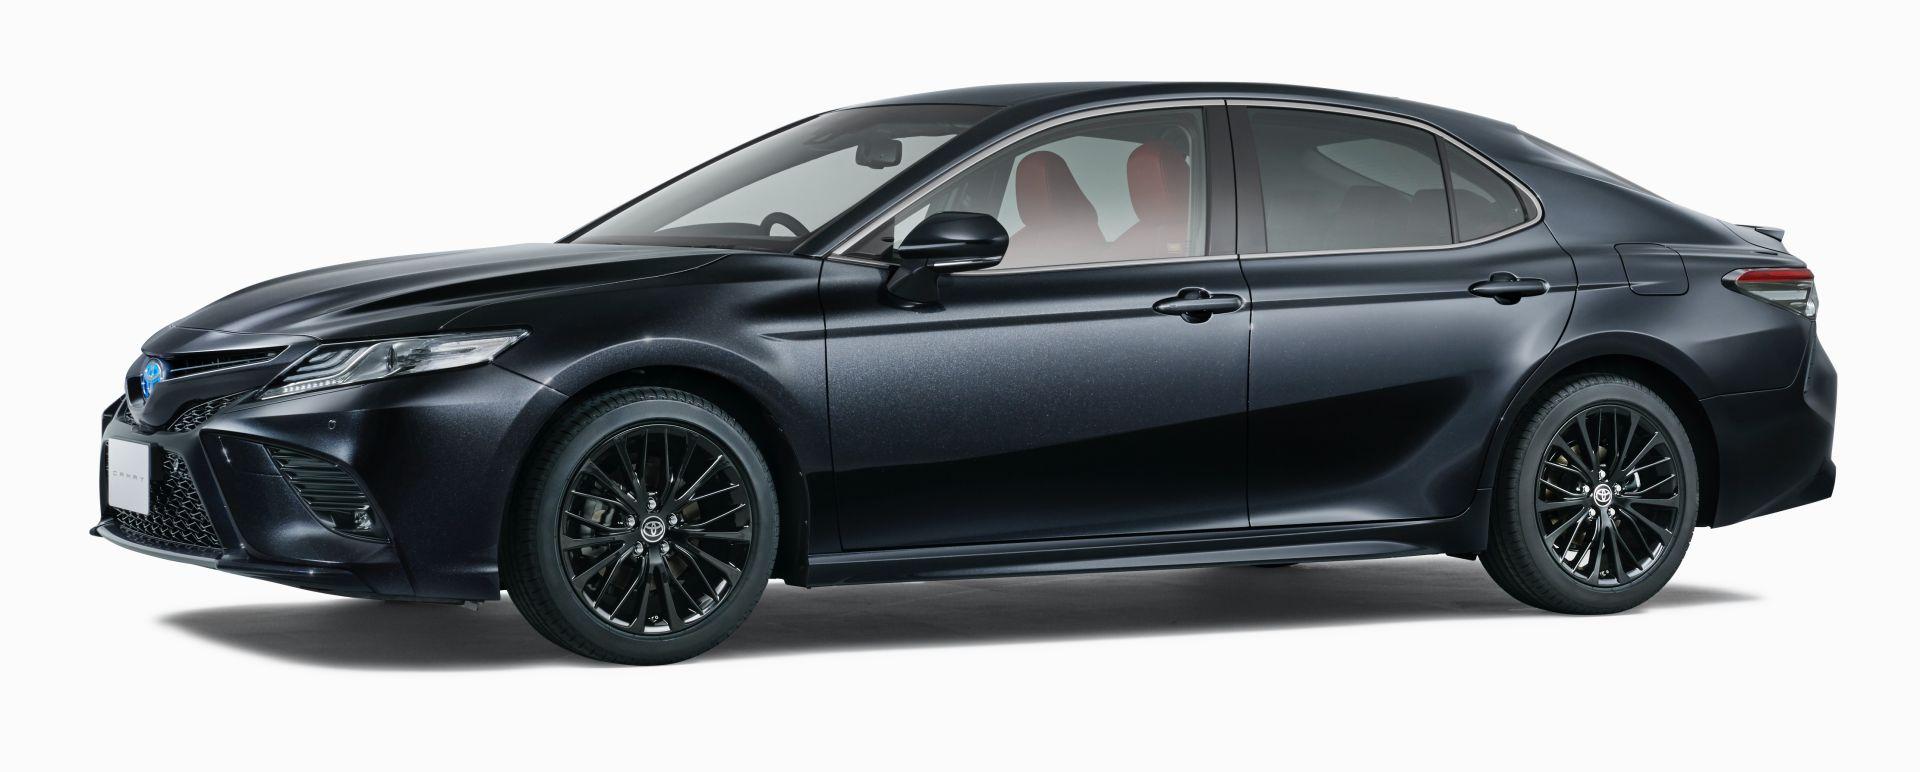 2020-toyota-camry-black-edition-jdm-spec-3.jpg